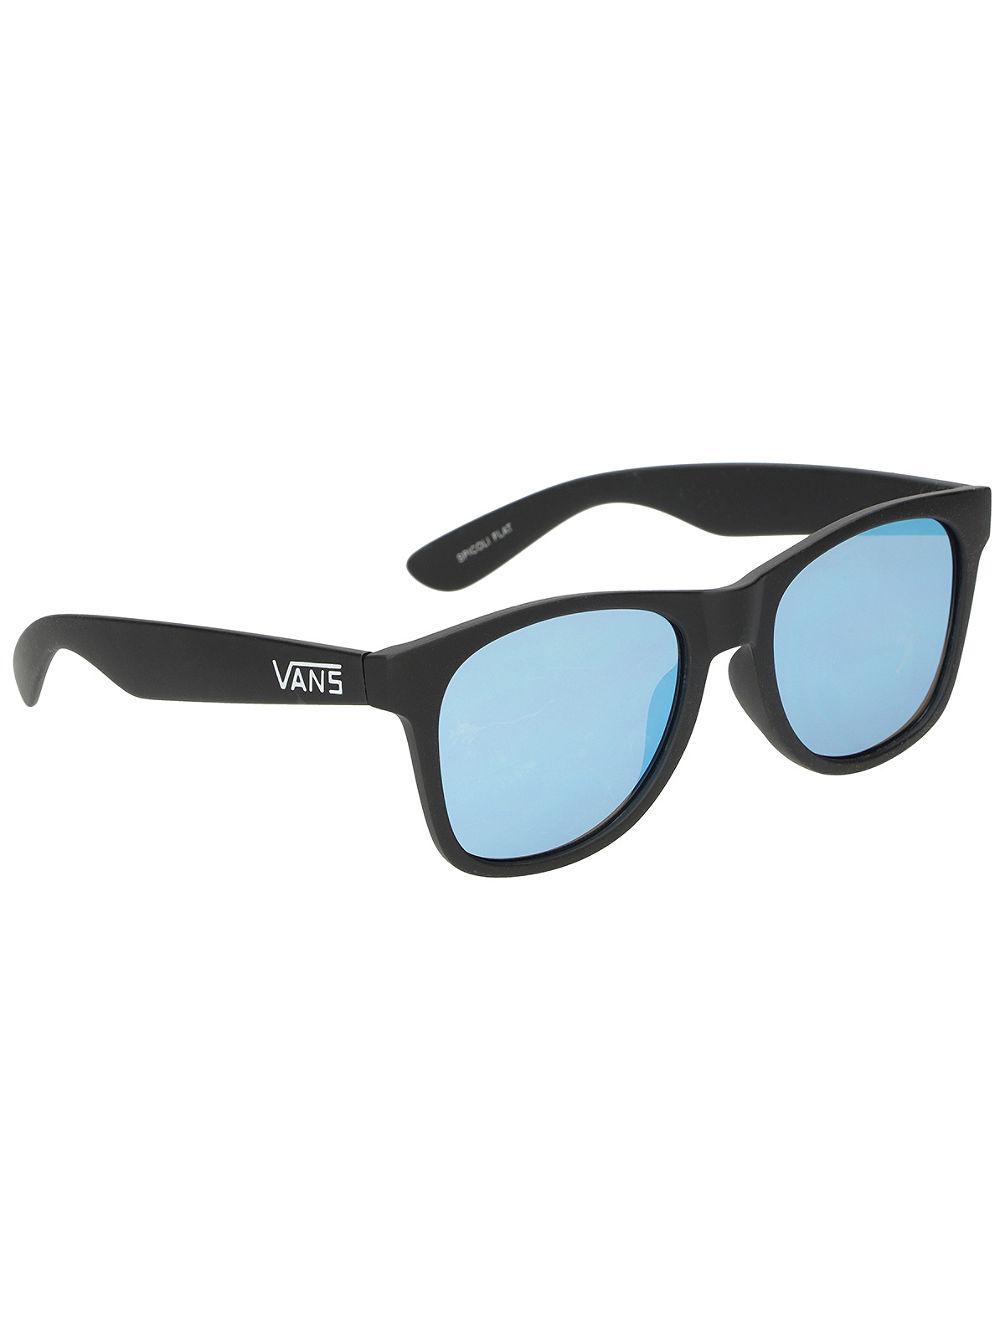 a7dee0dc38 Buy Vans Spicoli Flat Black Light Blue online at blue-tomato.com